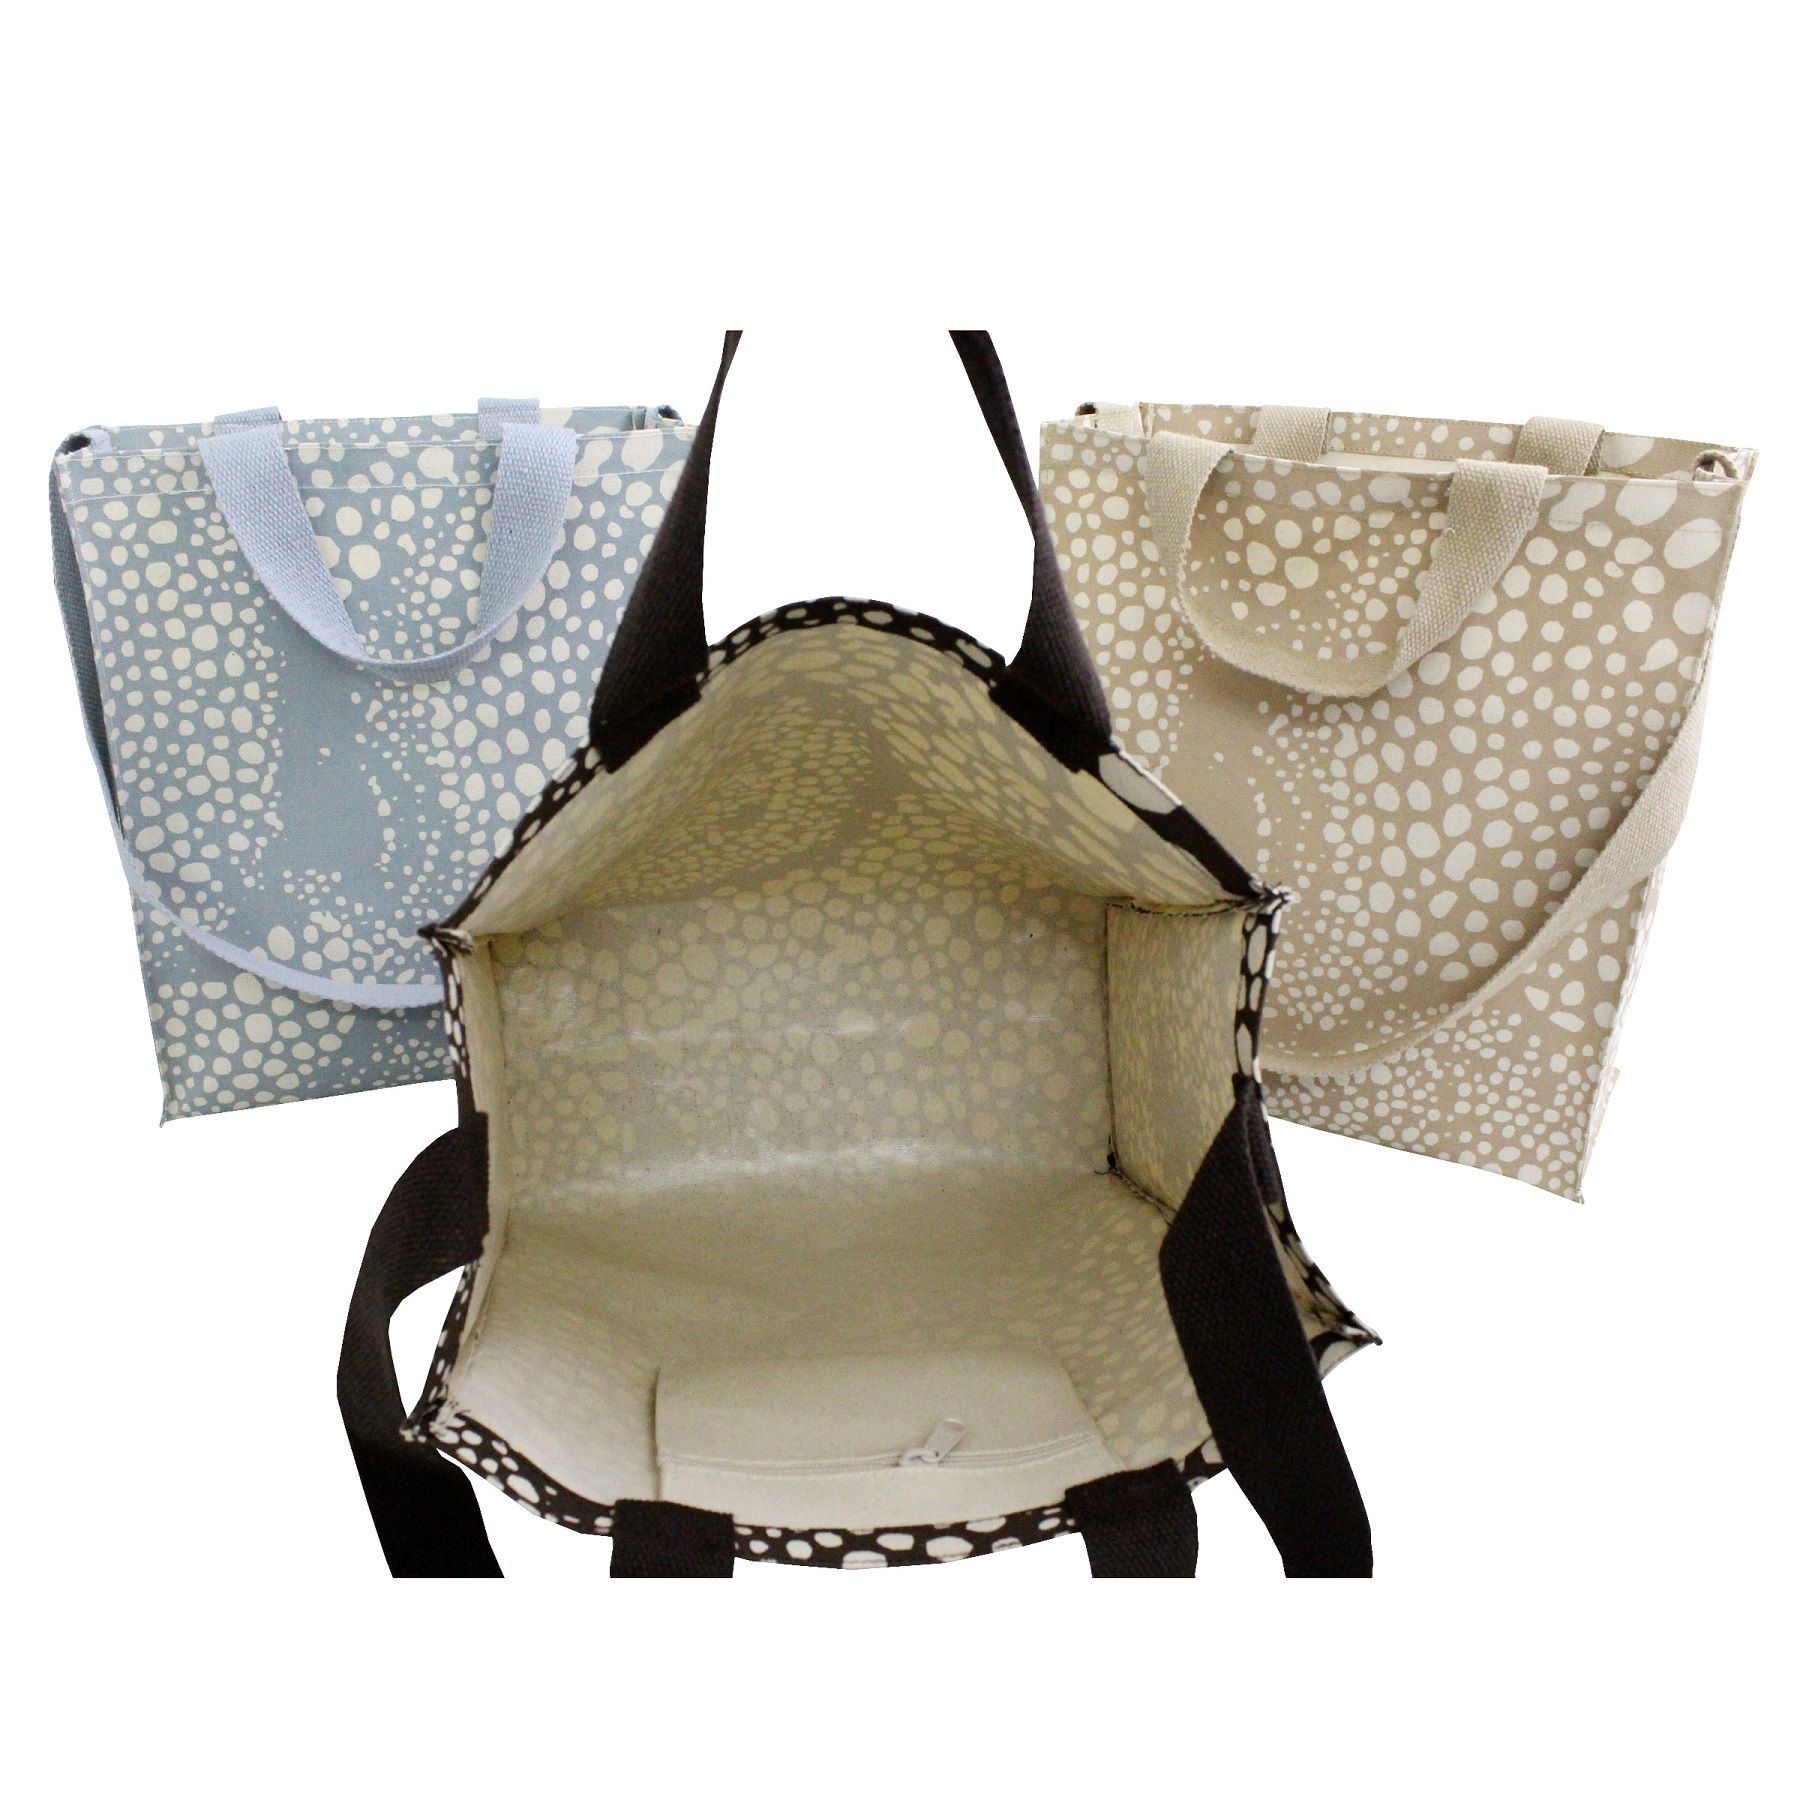 10 Oz PP Laminated Canvas Tote Bag With Short & Long Handle